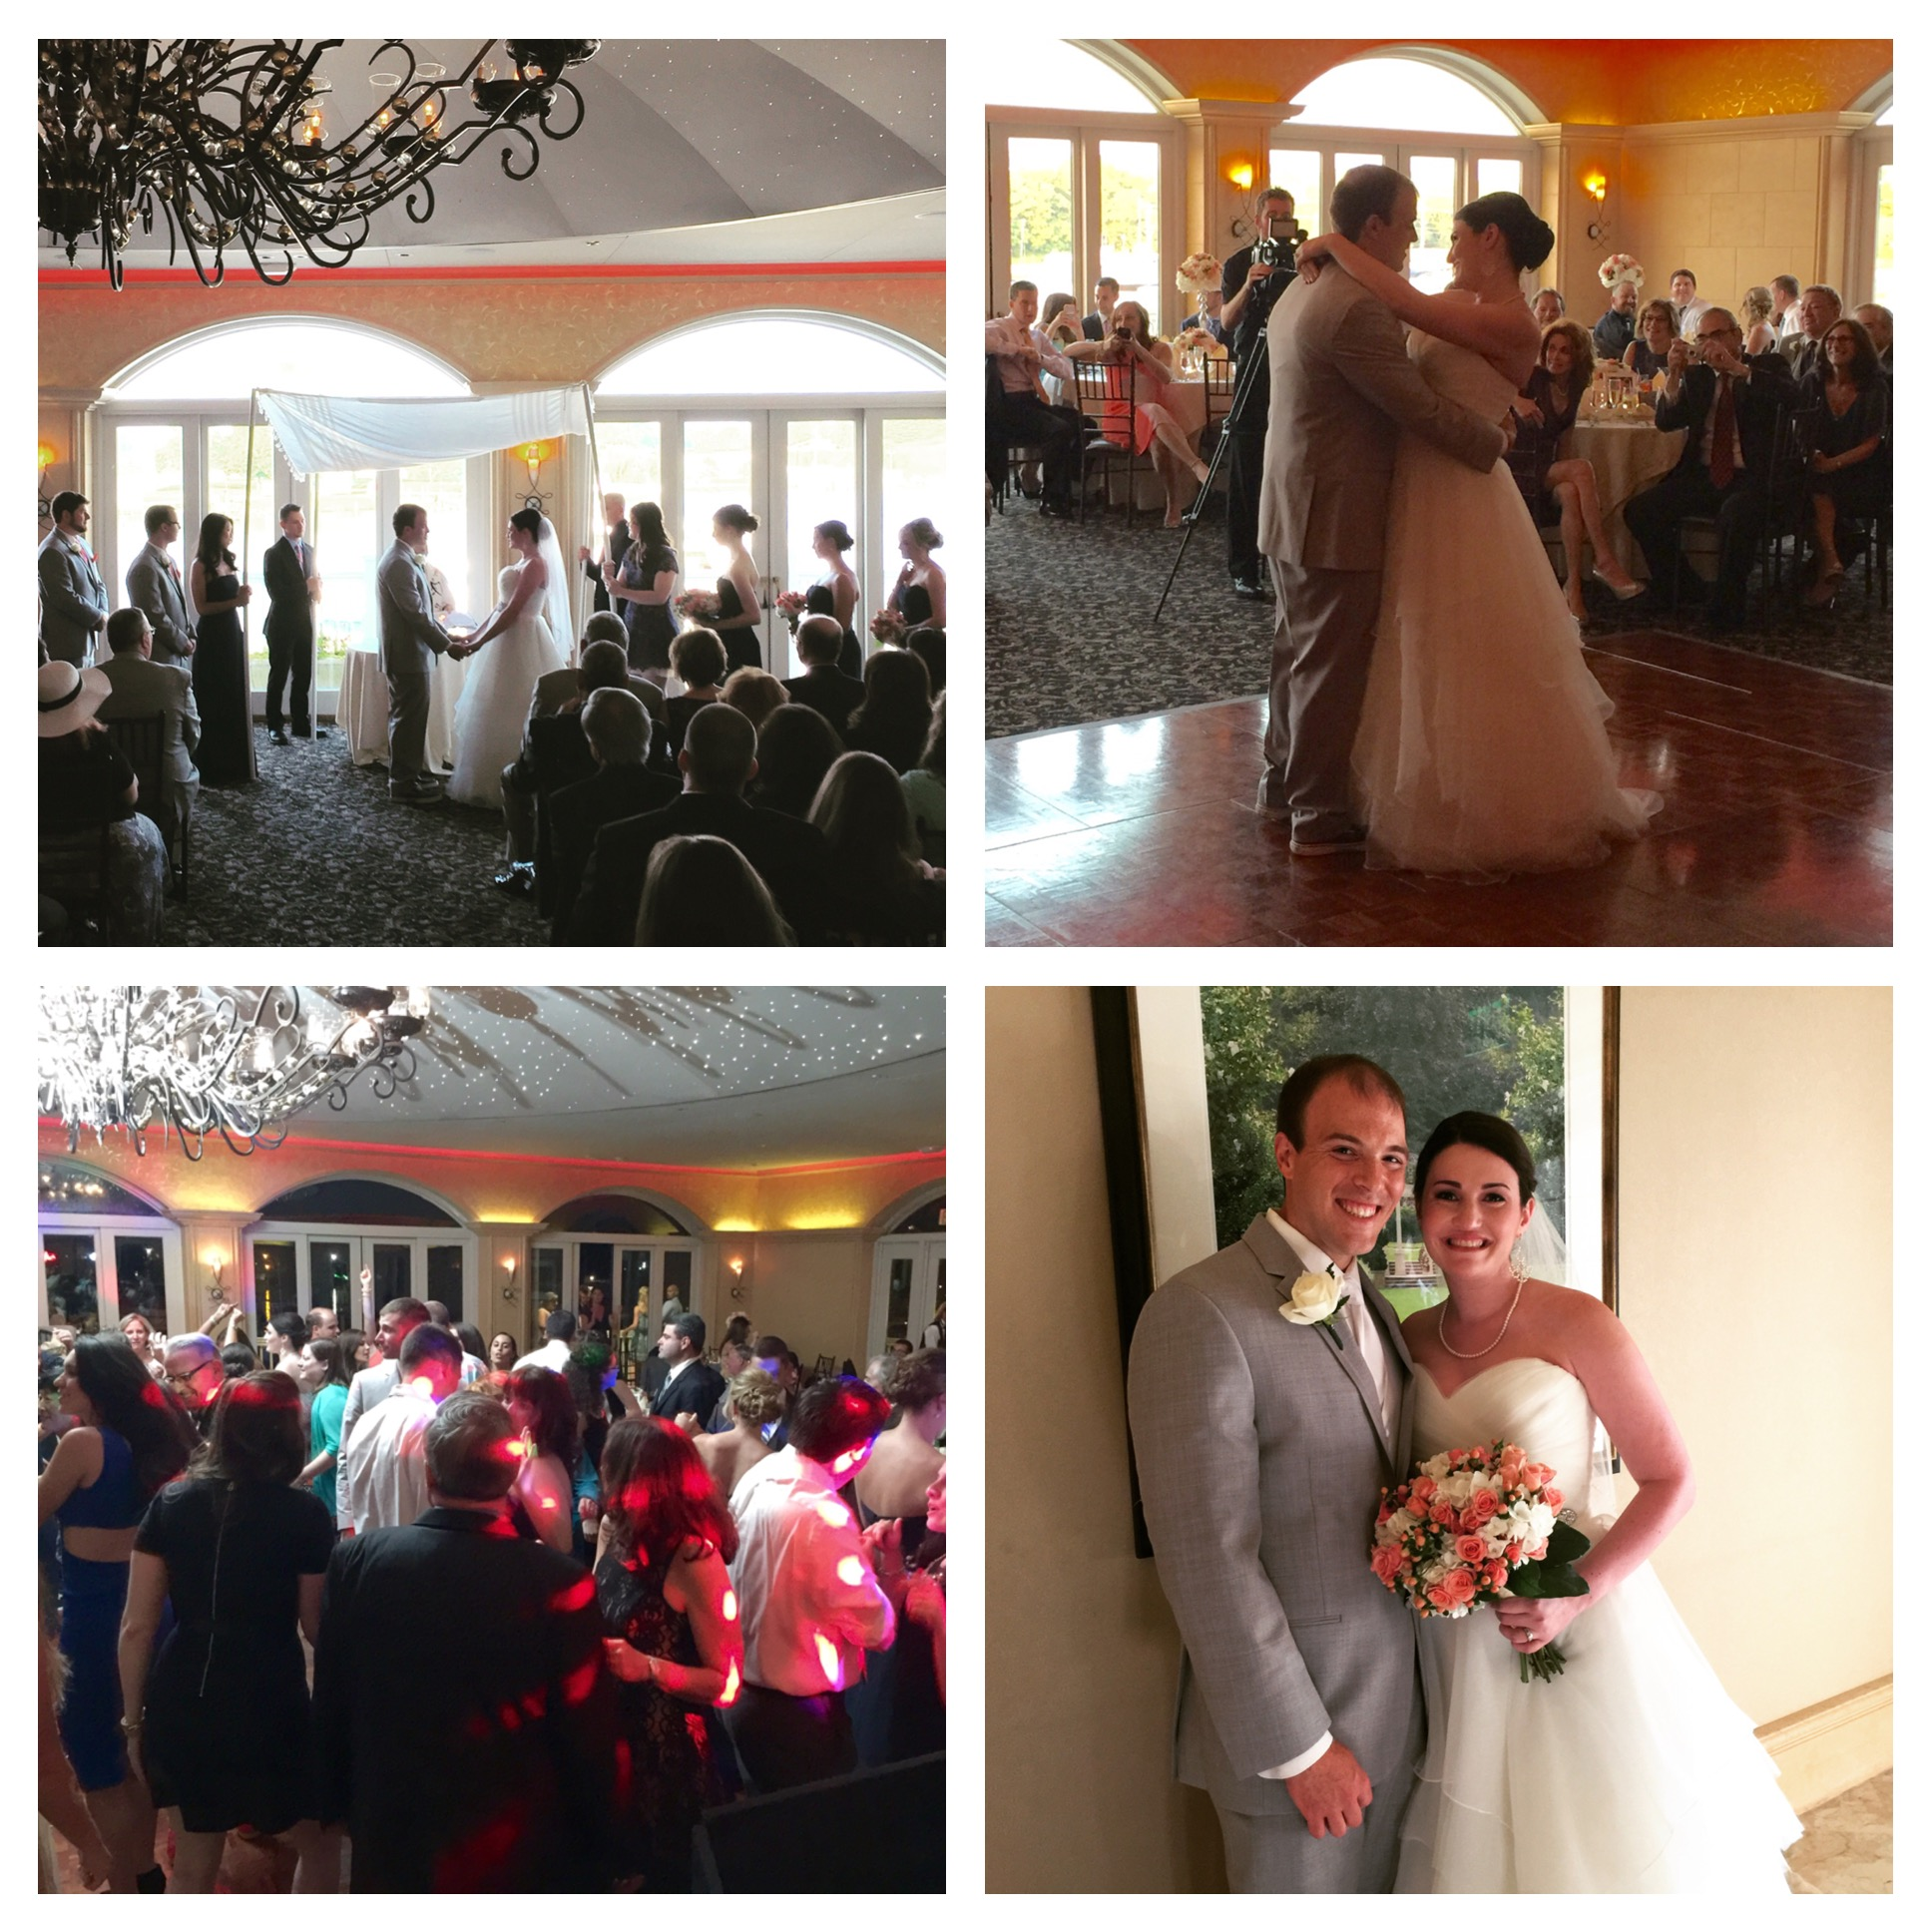 Ali Kyle S Wedding Reception At The Chesapeake Inn Ballroom